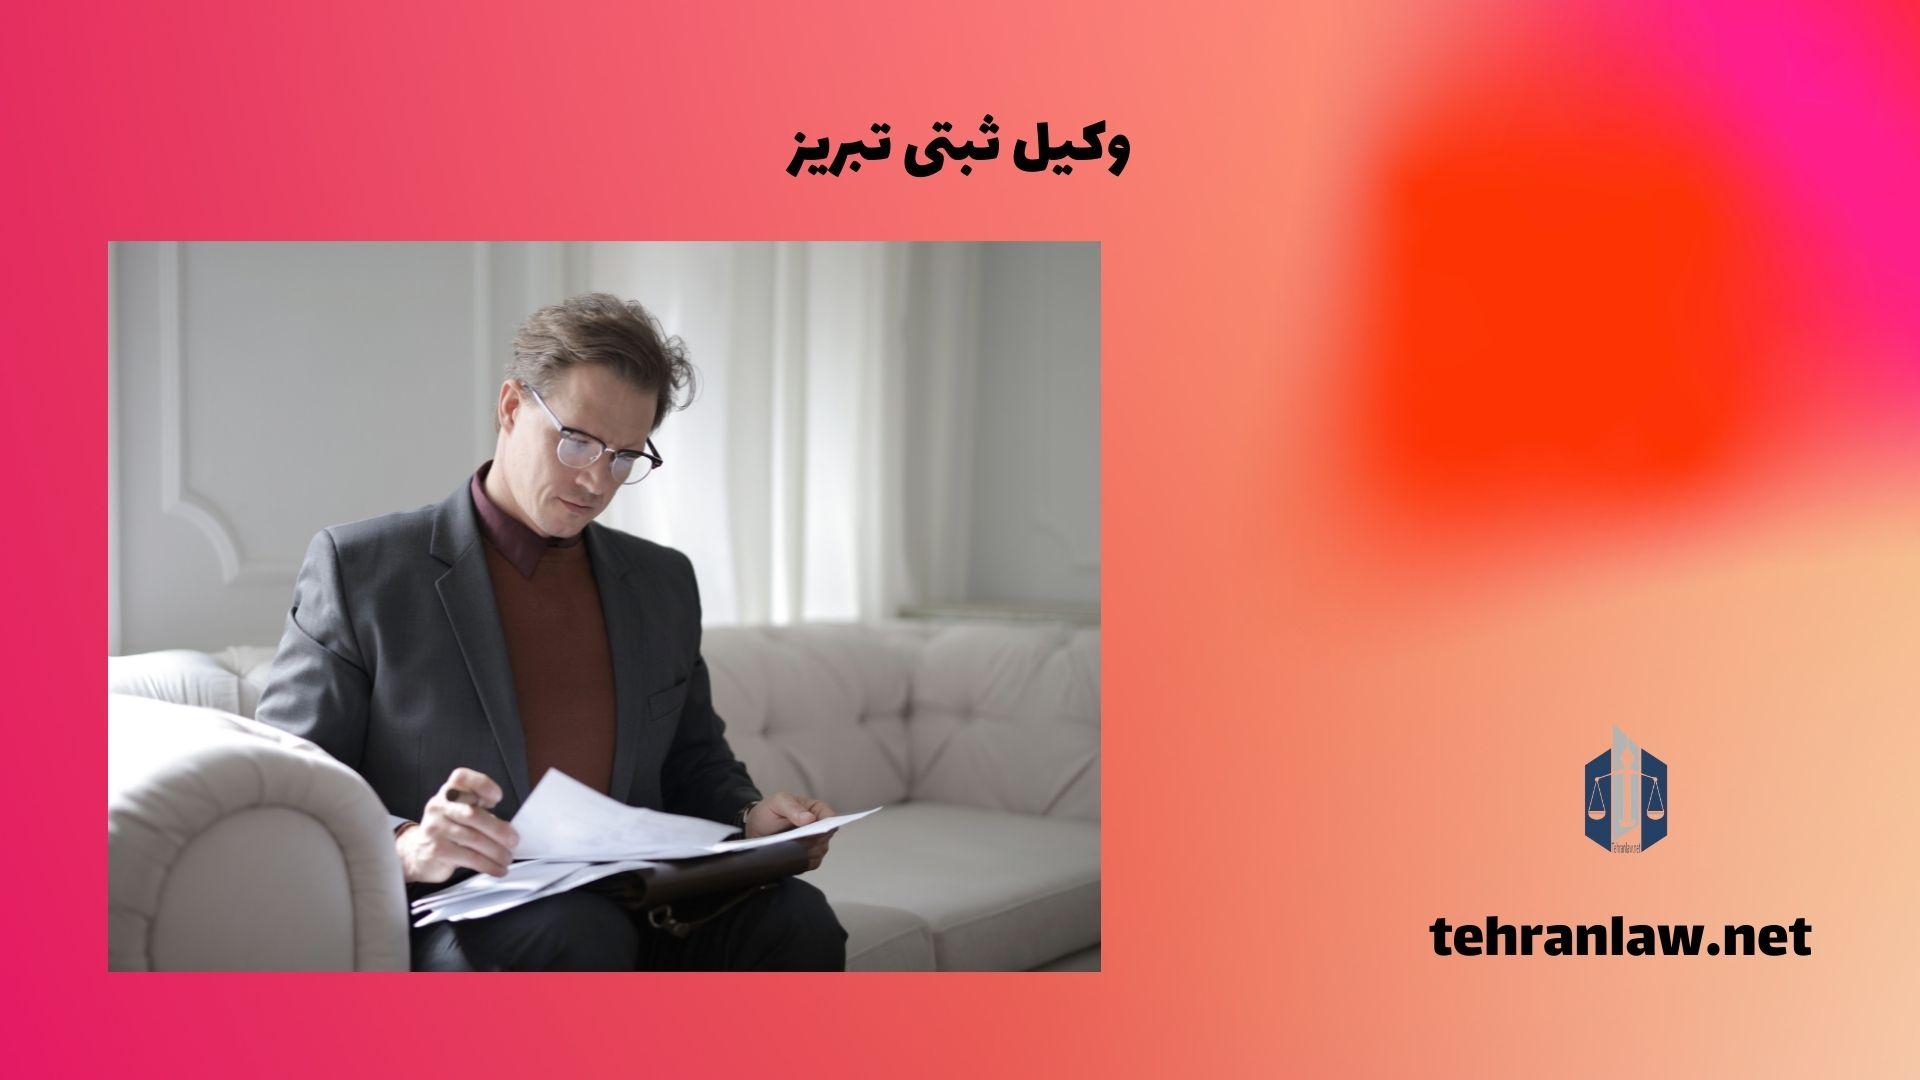 وکیل ثبتی تبریز